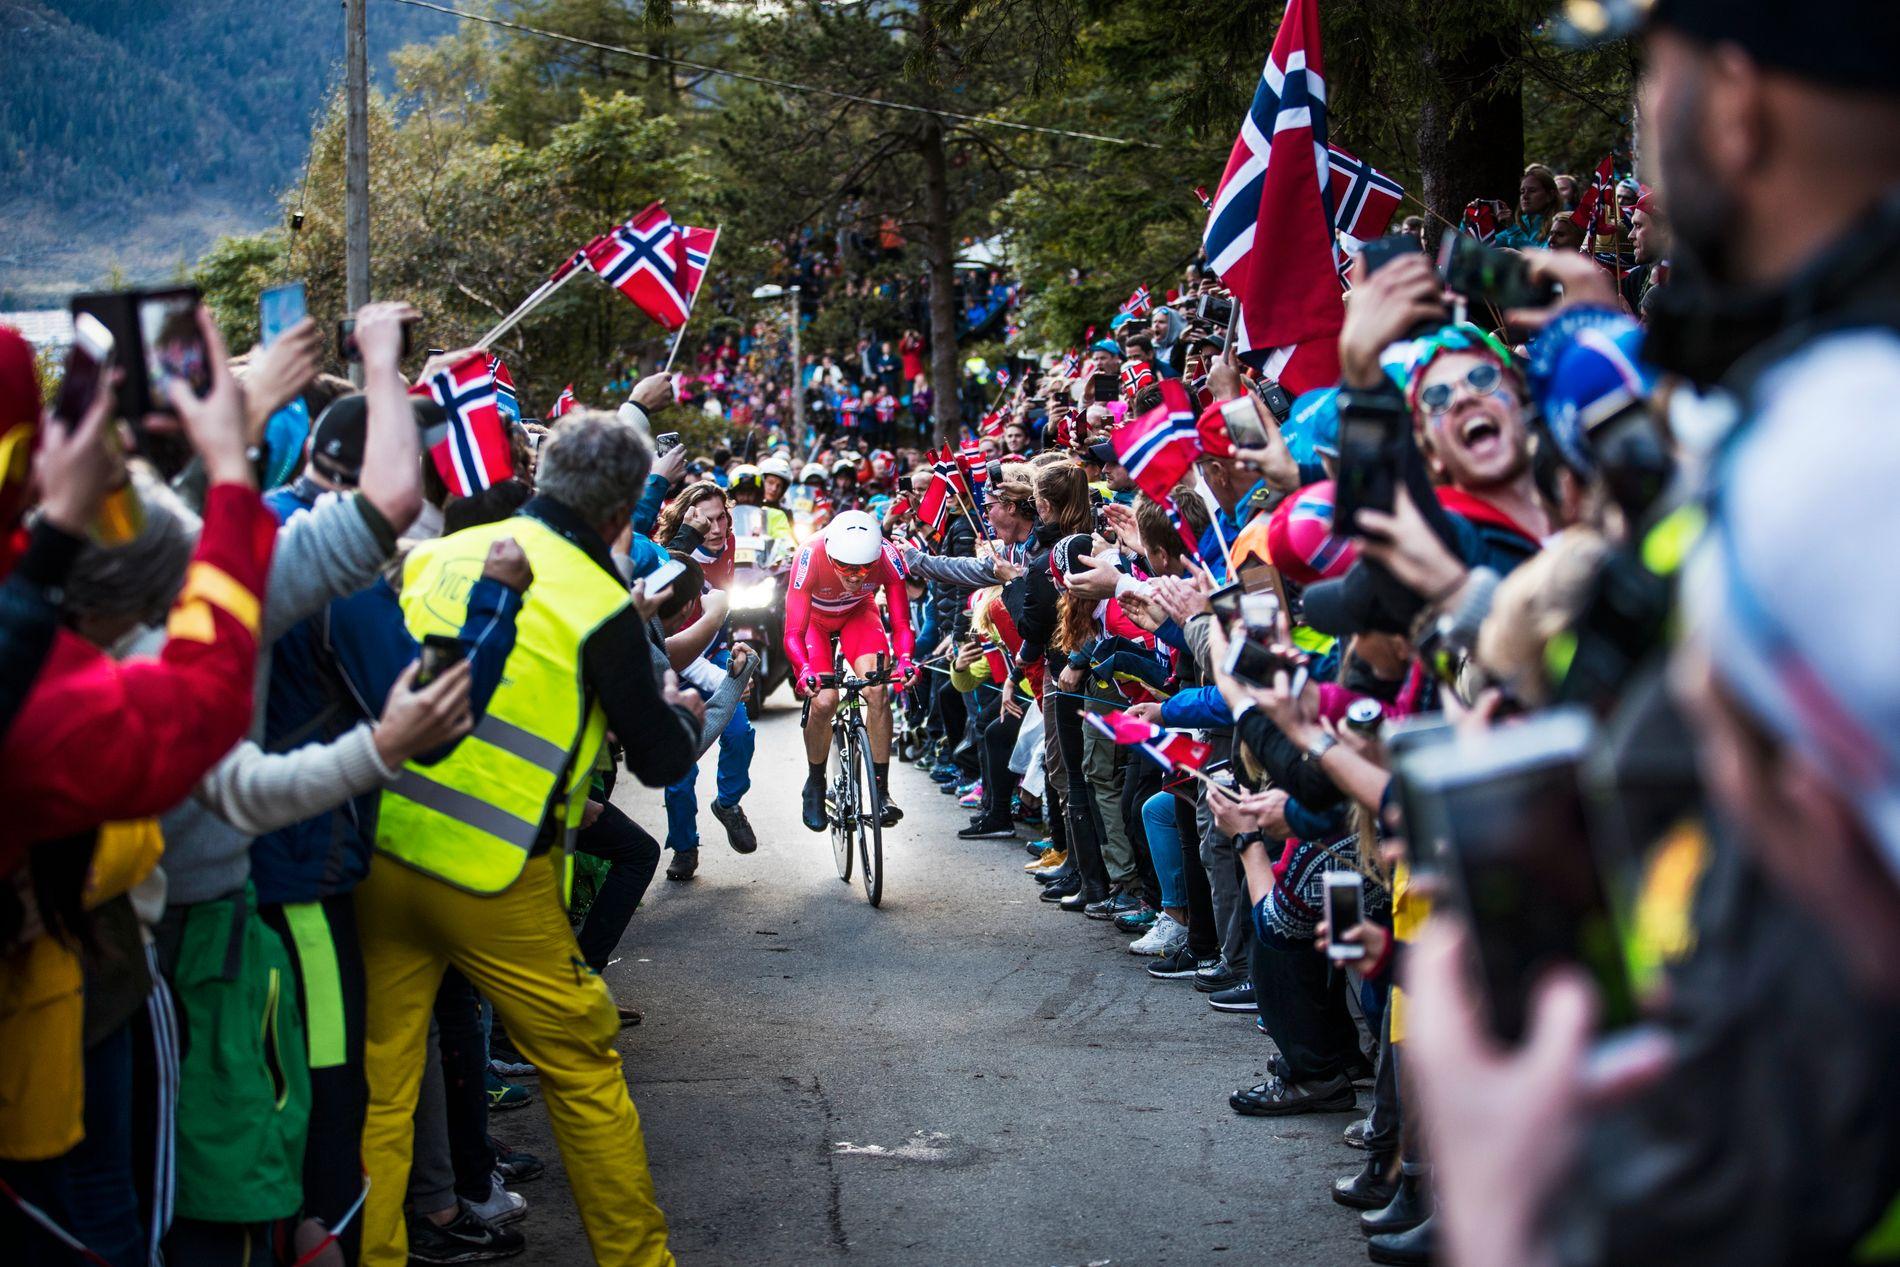 FOLKEFEST MED BISMAK: VM i Bergen har kostet arrangøren dyrt. Foto: Frode Hansen/VG